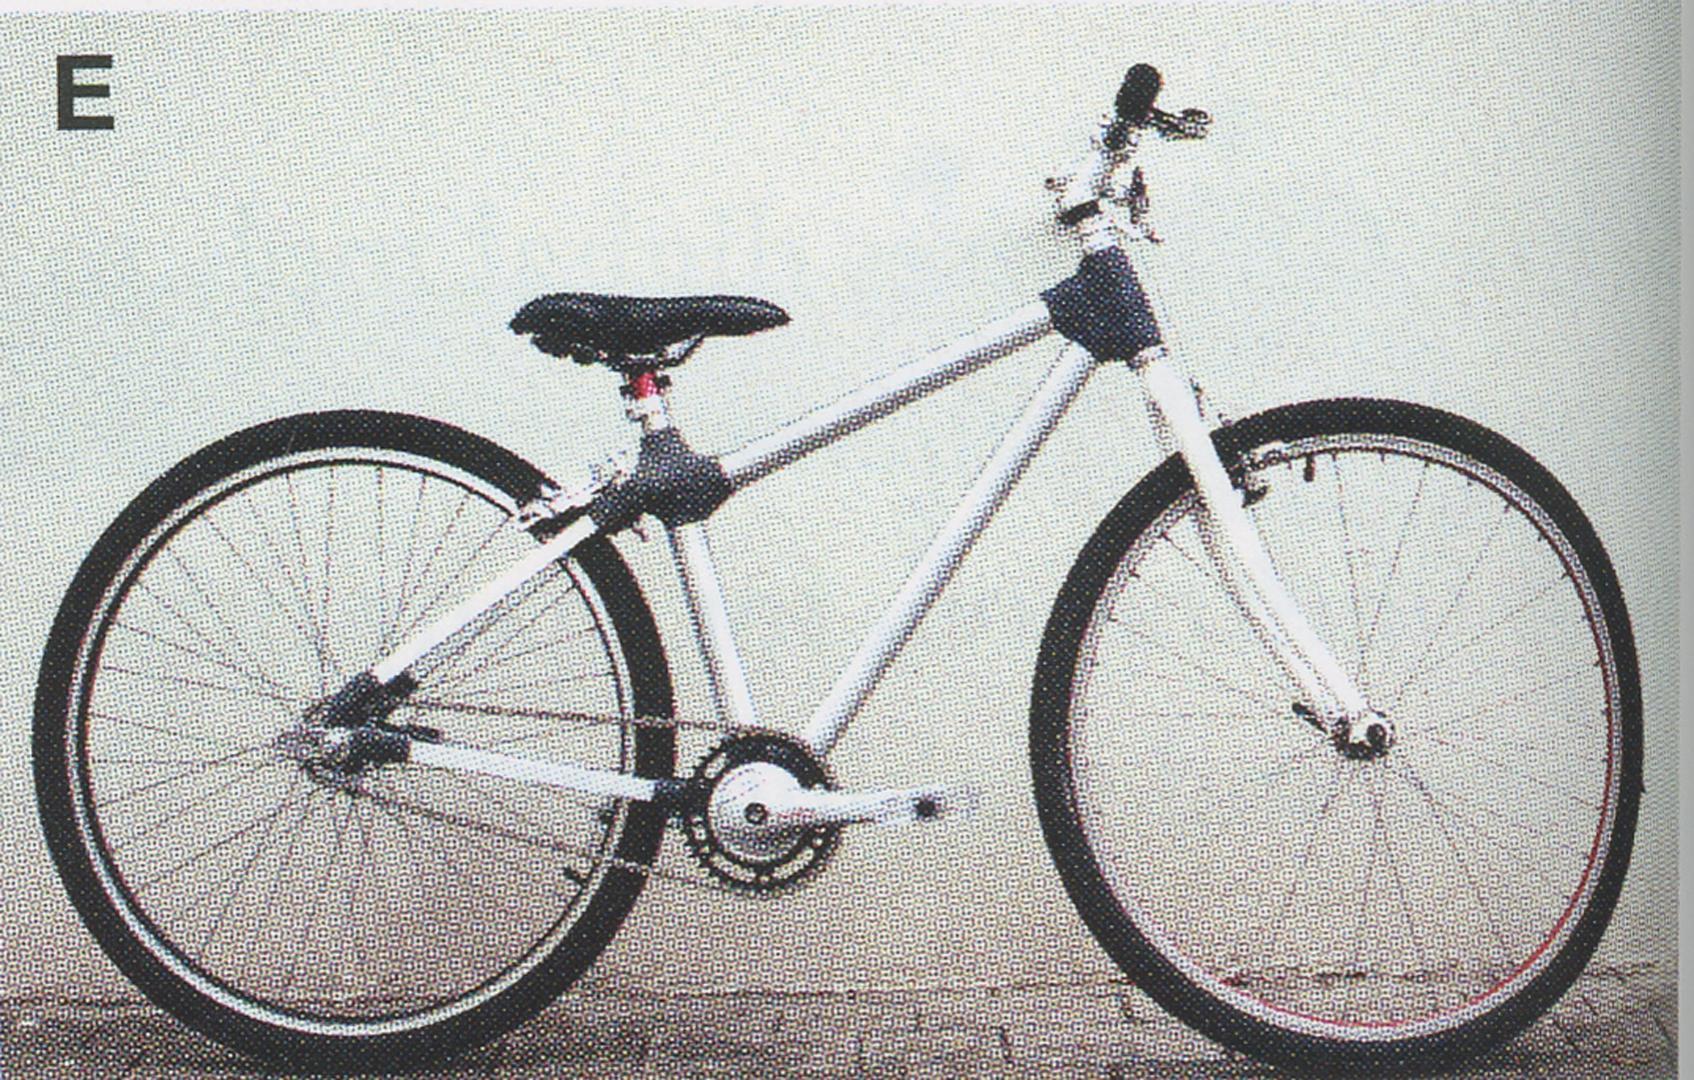 ©2015, Atar Brosh, Bicycle Frame Domestic Fabrication